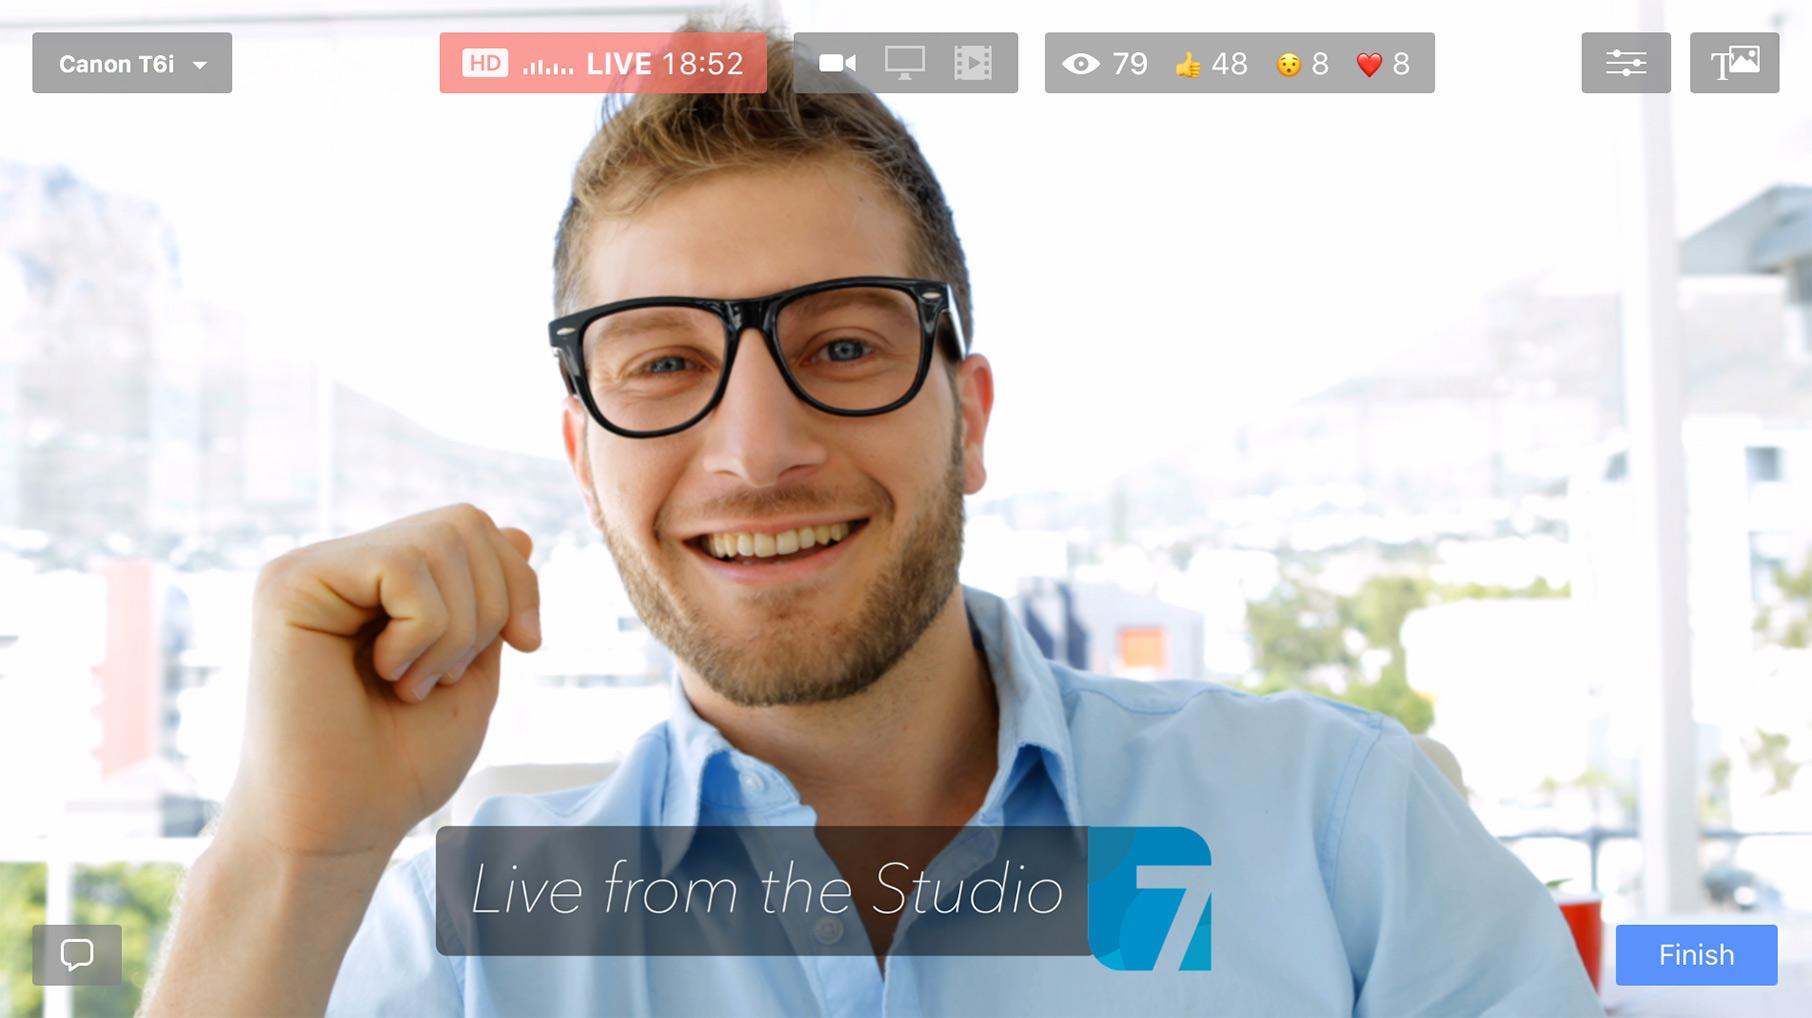 Ecamm Live - Powerful Facebook Live Platform for Mac - Ecamm Network